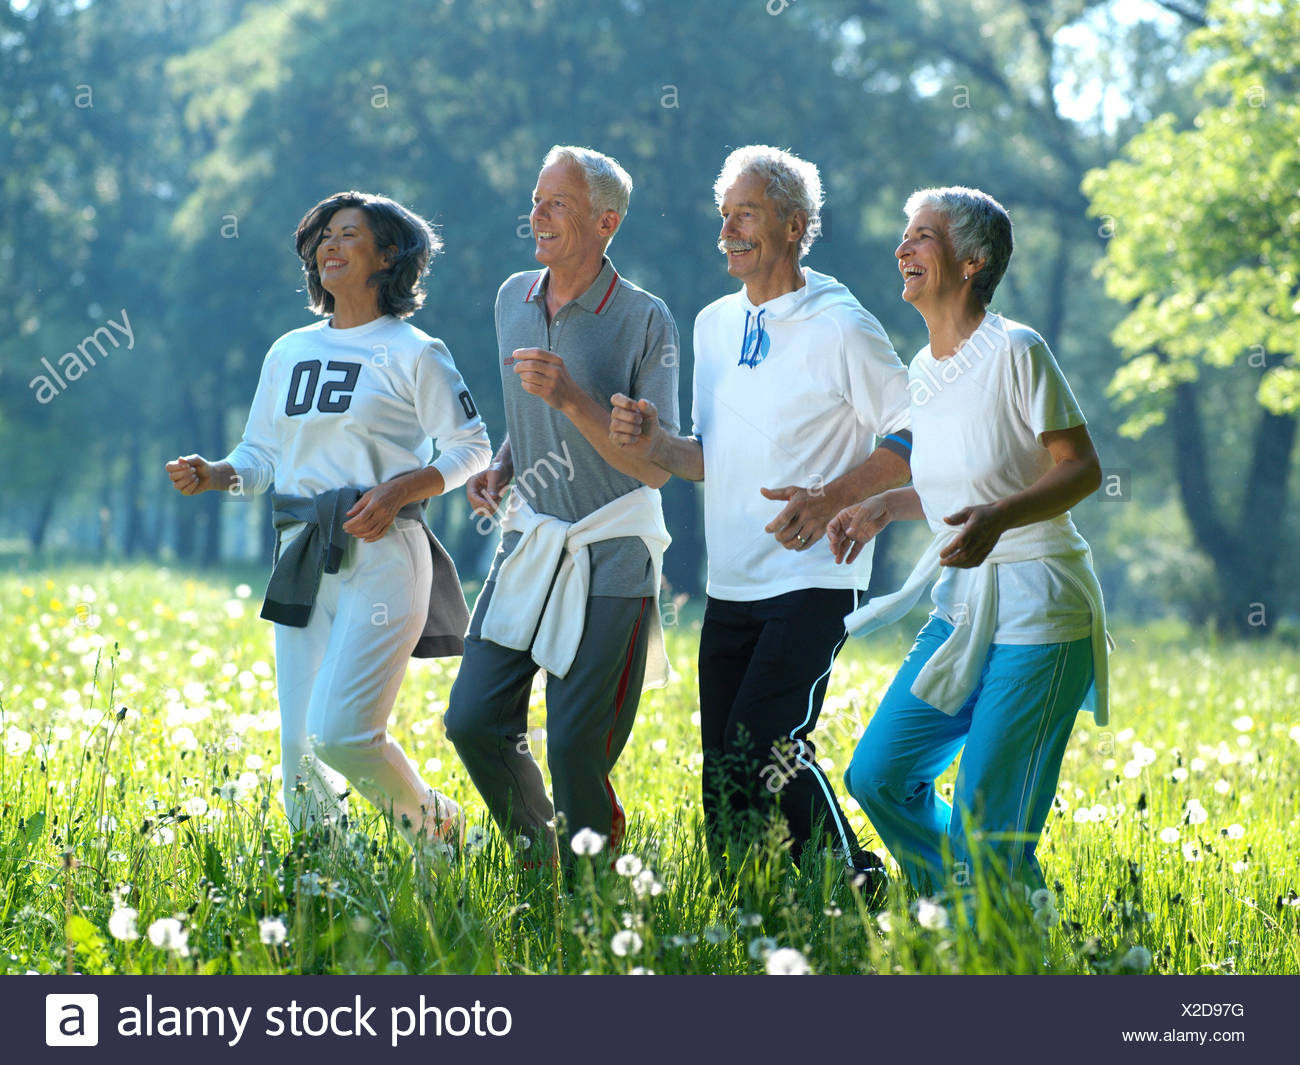 wood lumen senior citizens jog run at the side group group